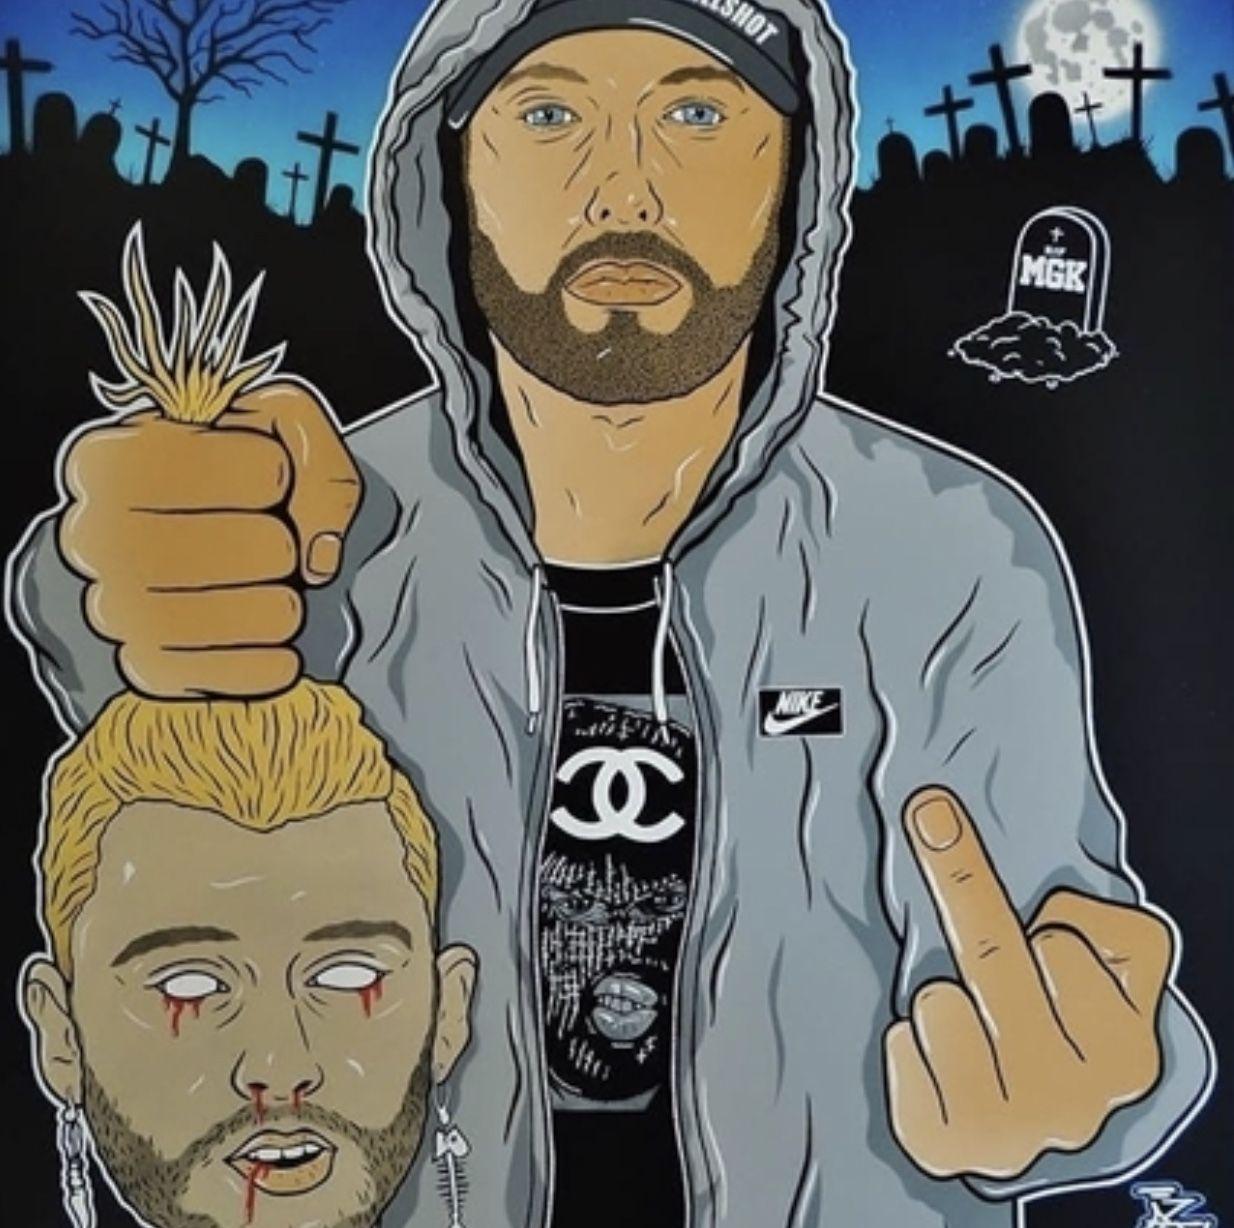 Pin By Jackie Trujillo On Eminem Eminem Rap Eminem Eminem Drawing